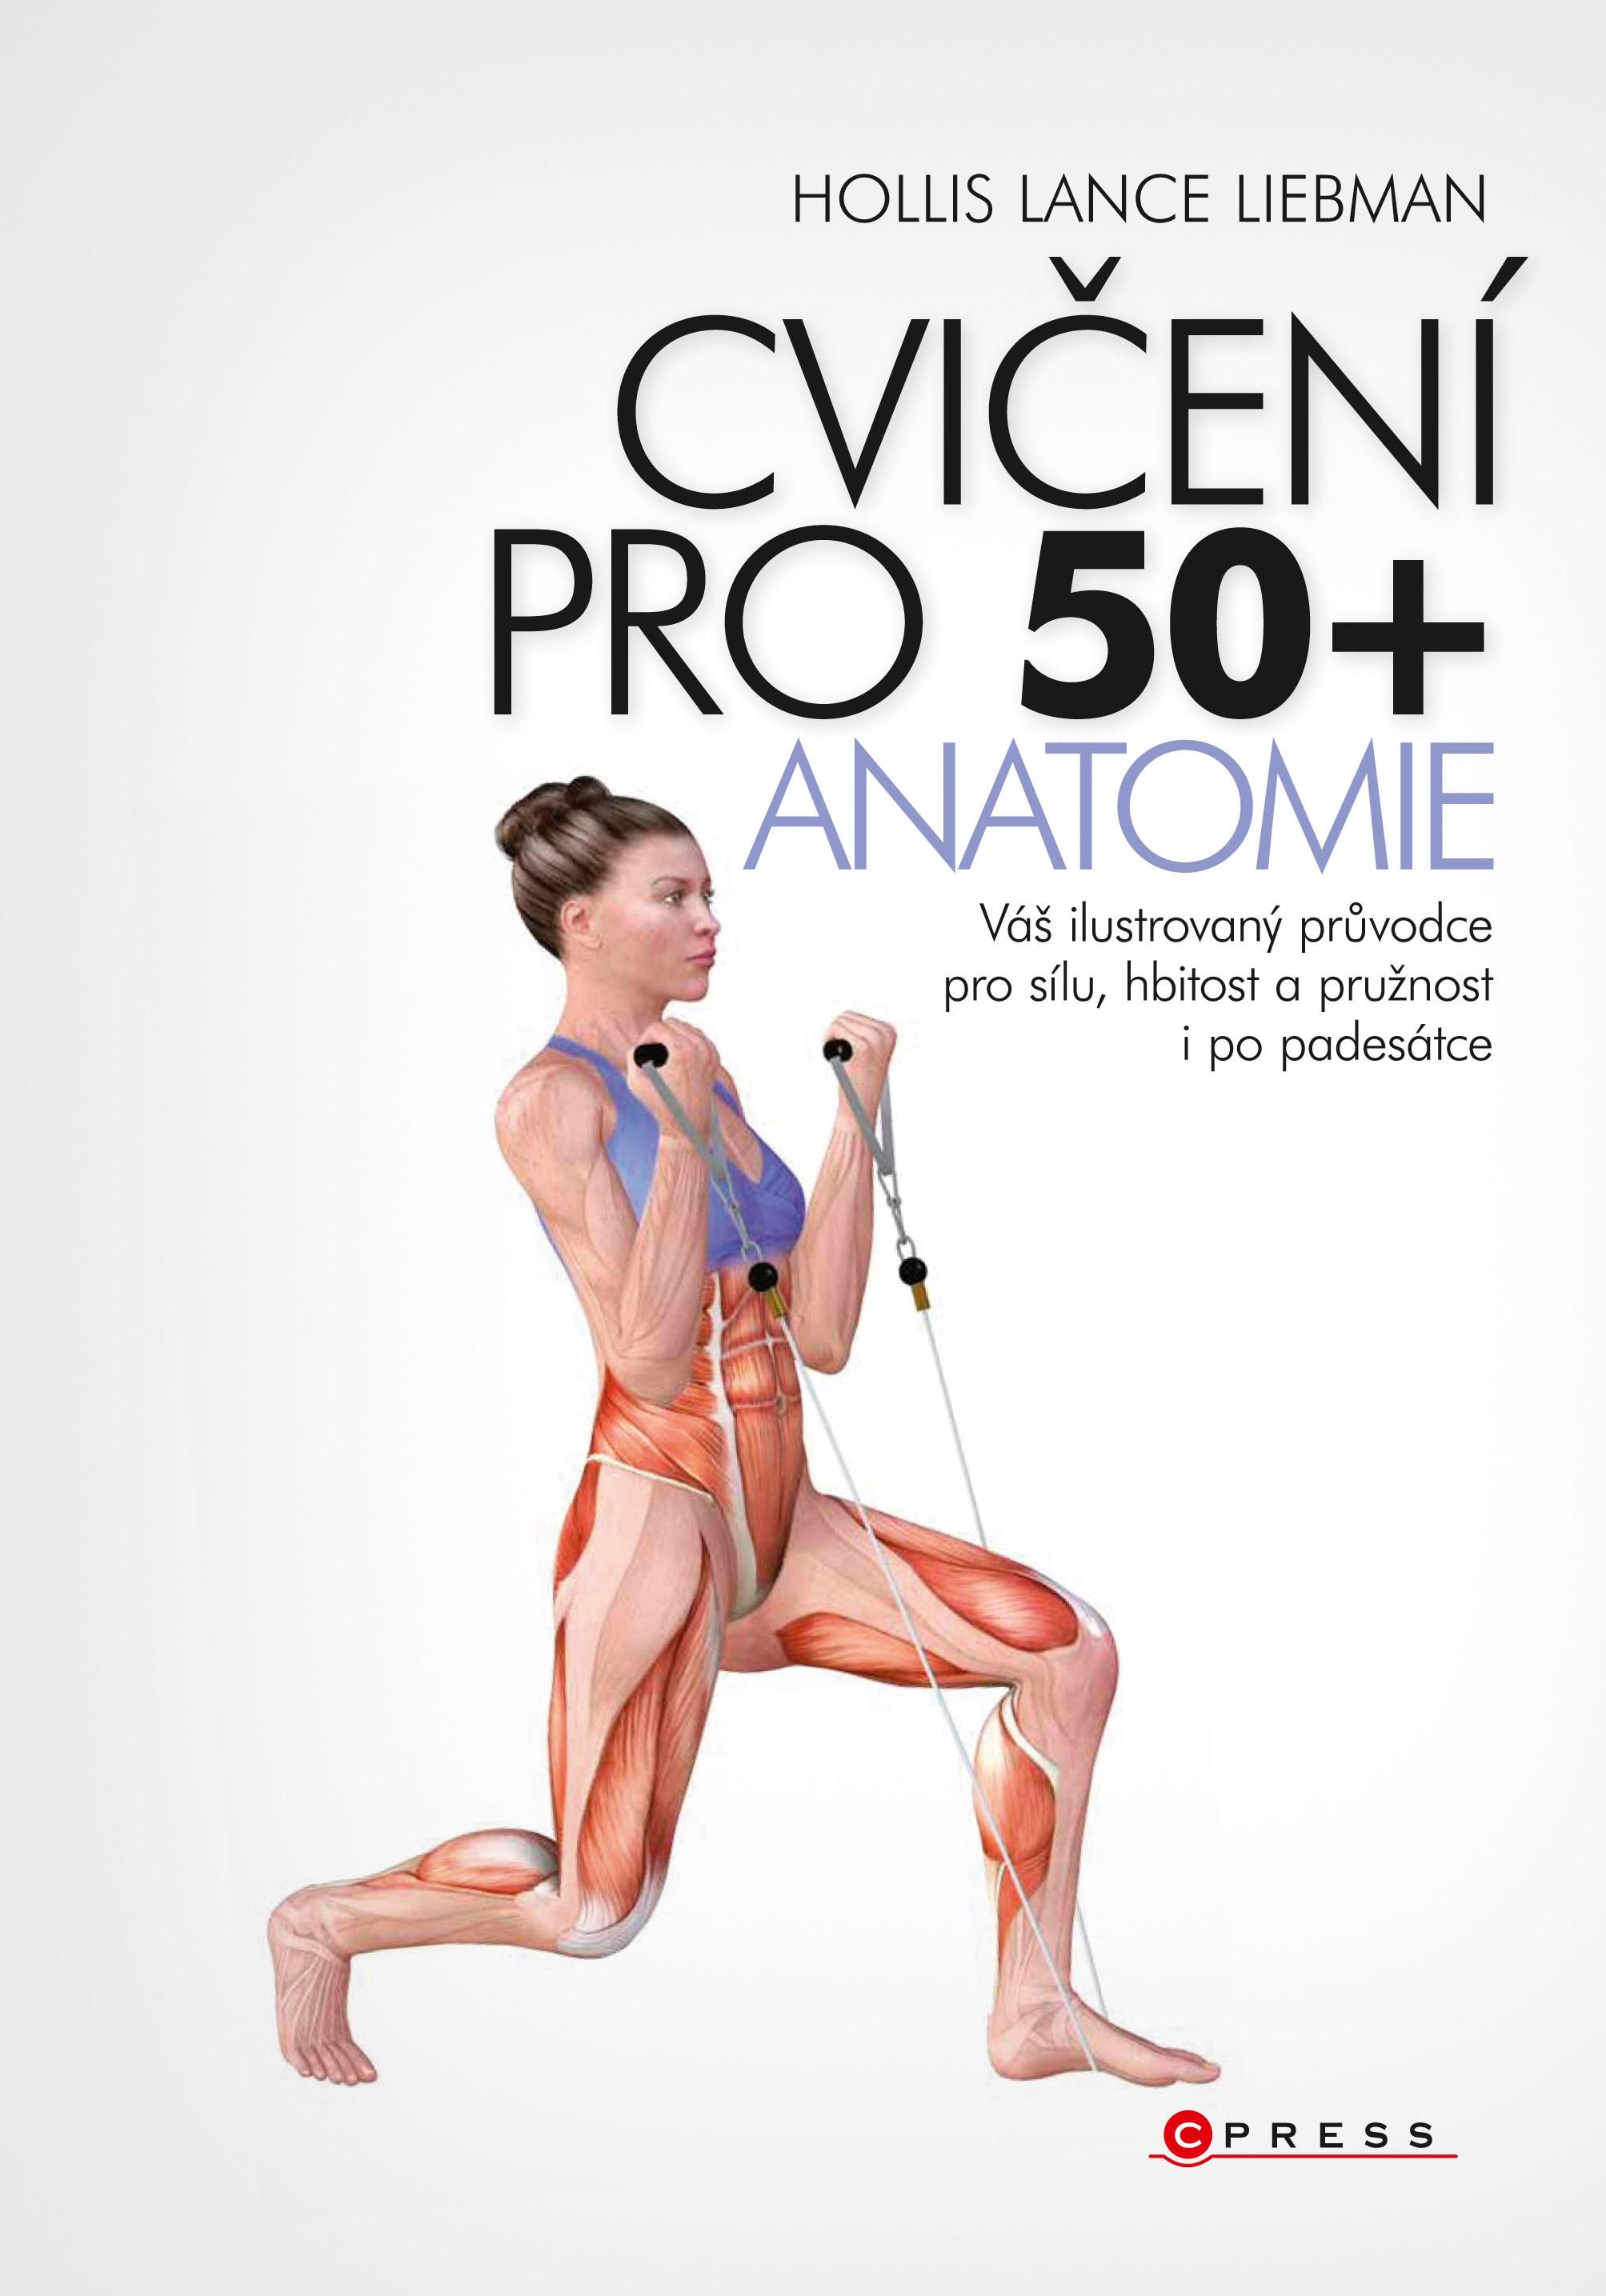 Cvičení pro 50+ anatomie   Hollis Liebman